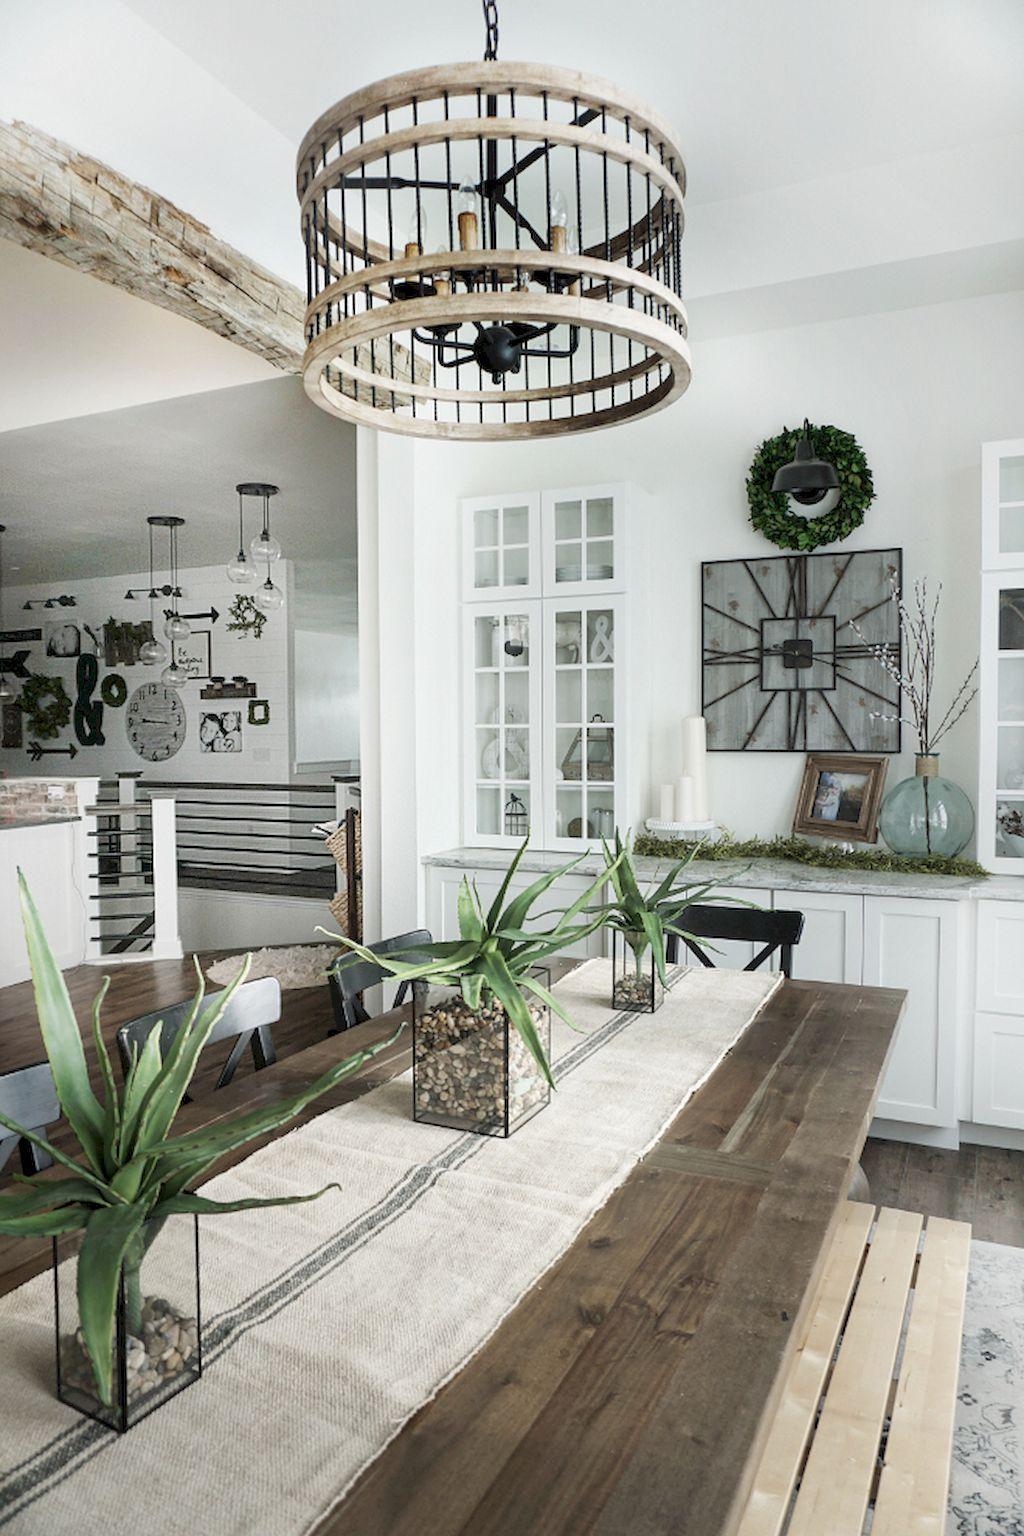 100 Rustic Farmhouse Lighting Ideas On A Budget (35